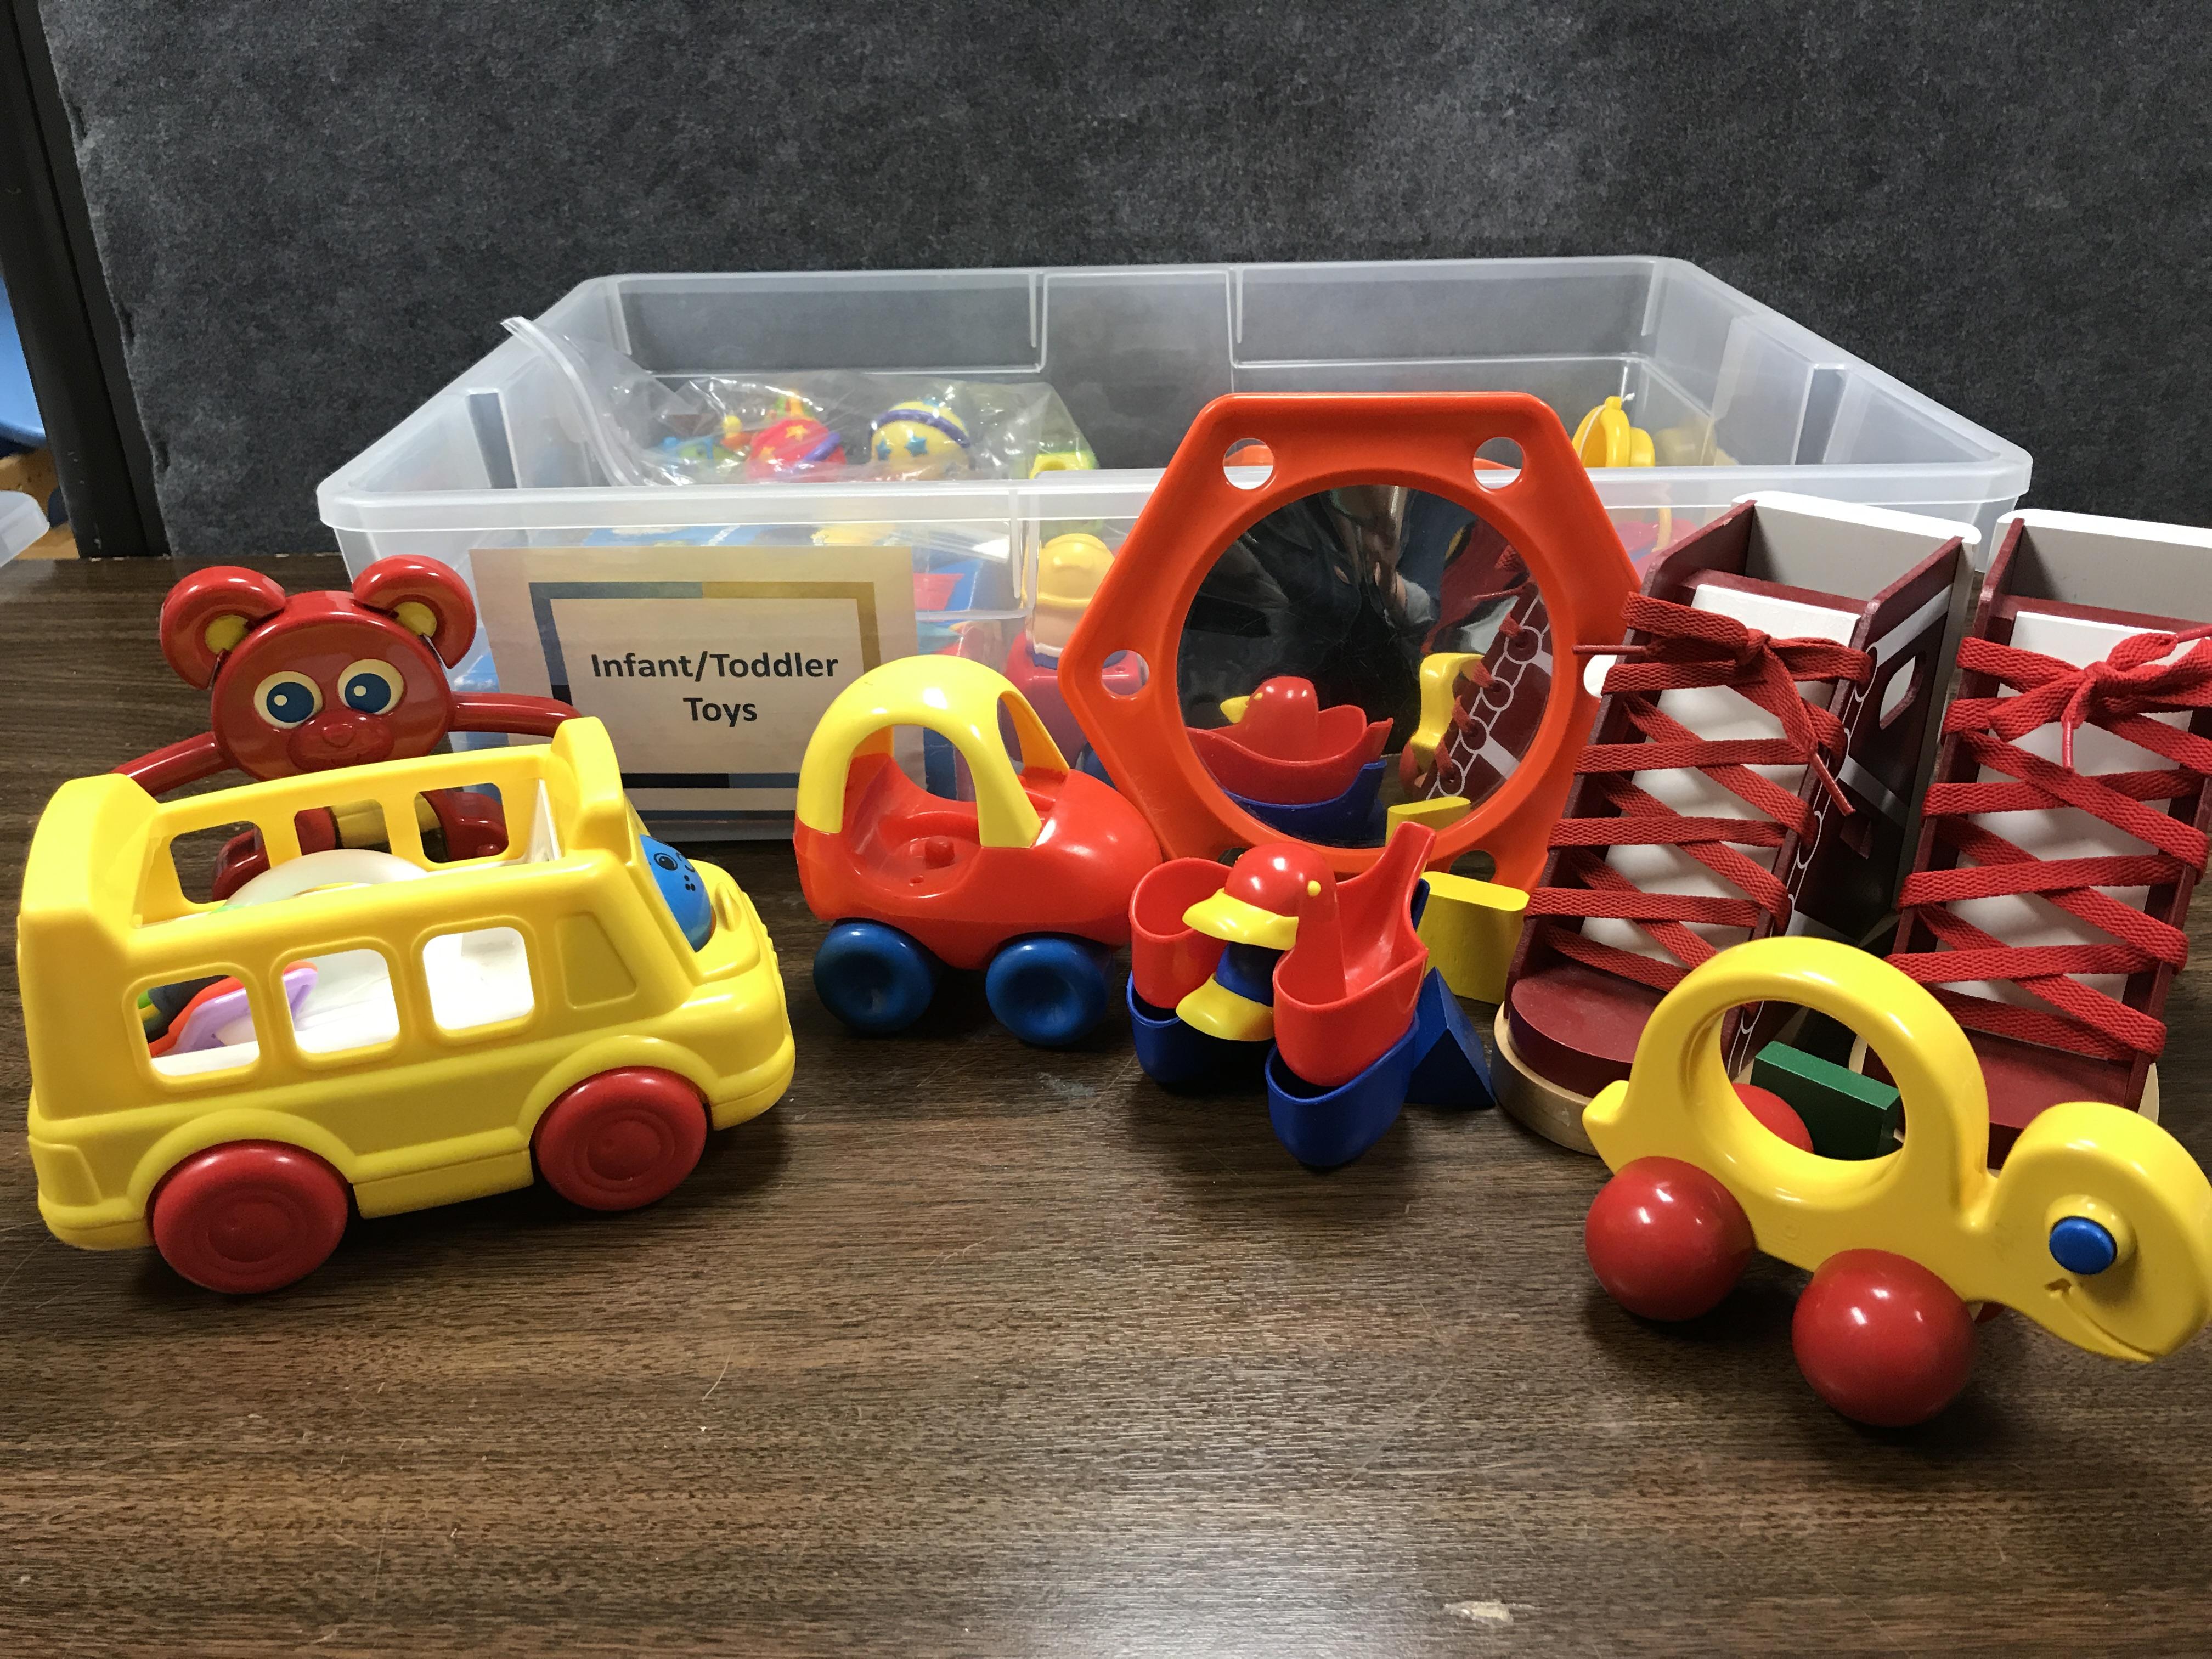 Infant Toddler Toys 2